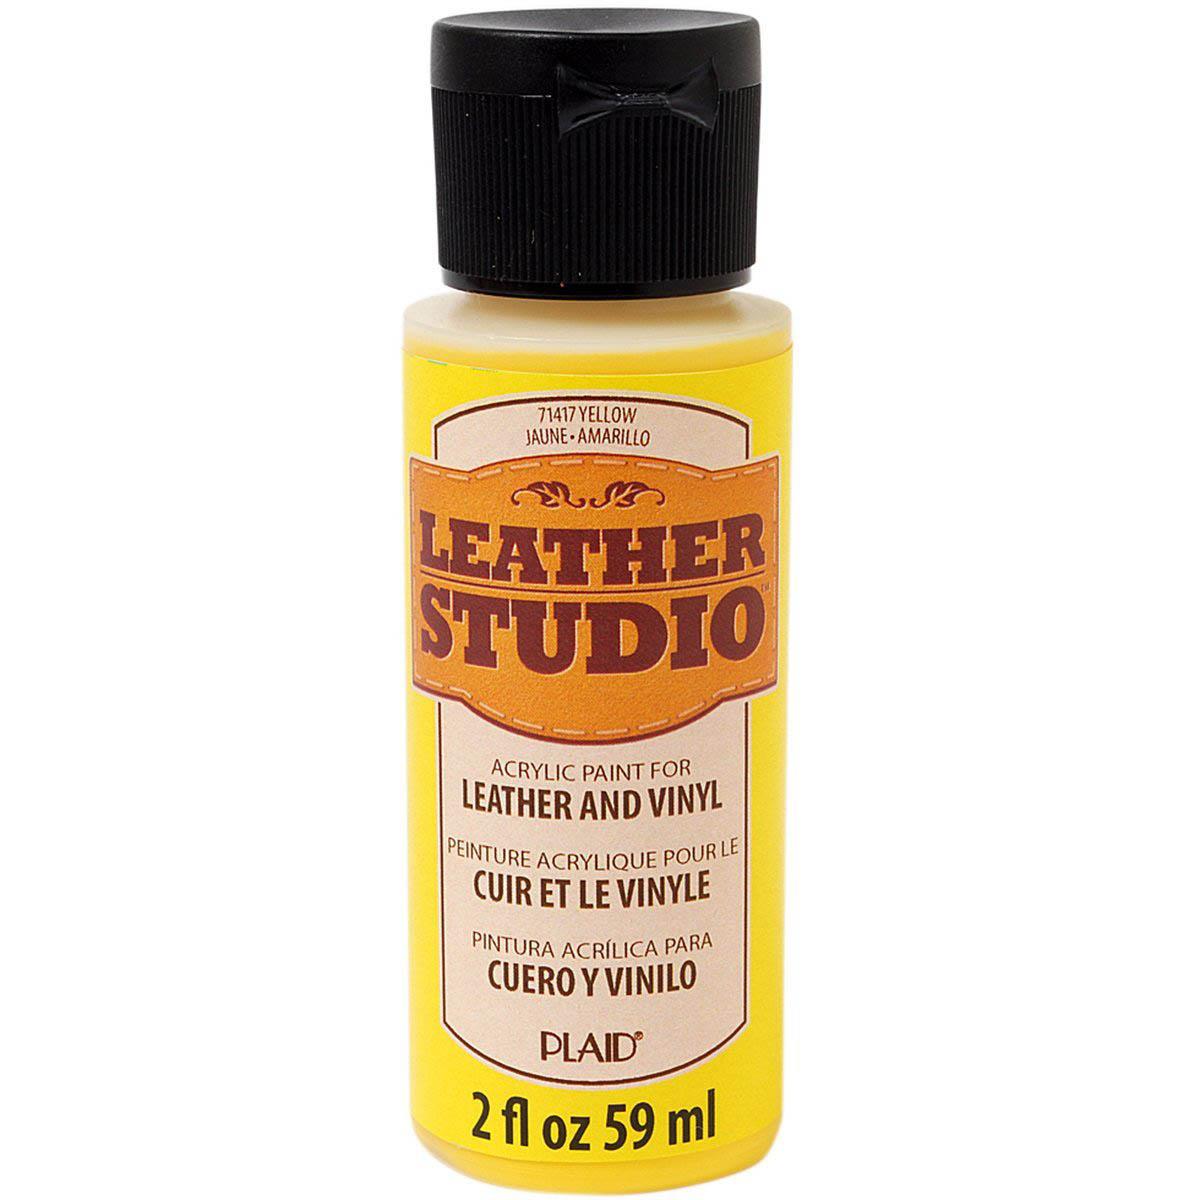 Leather Studio™ Leather & Vinyl Paint Colors - Yellow, 2 oz. - 71417